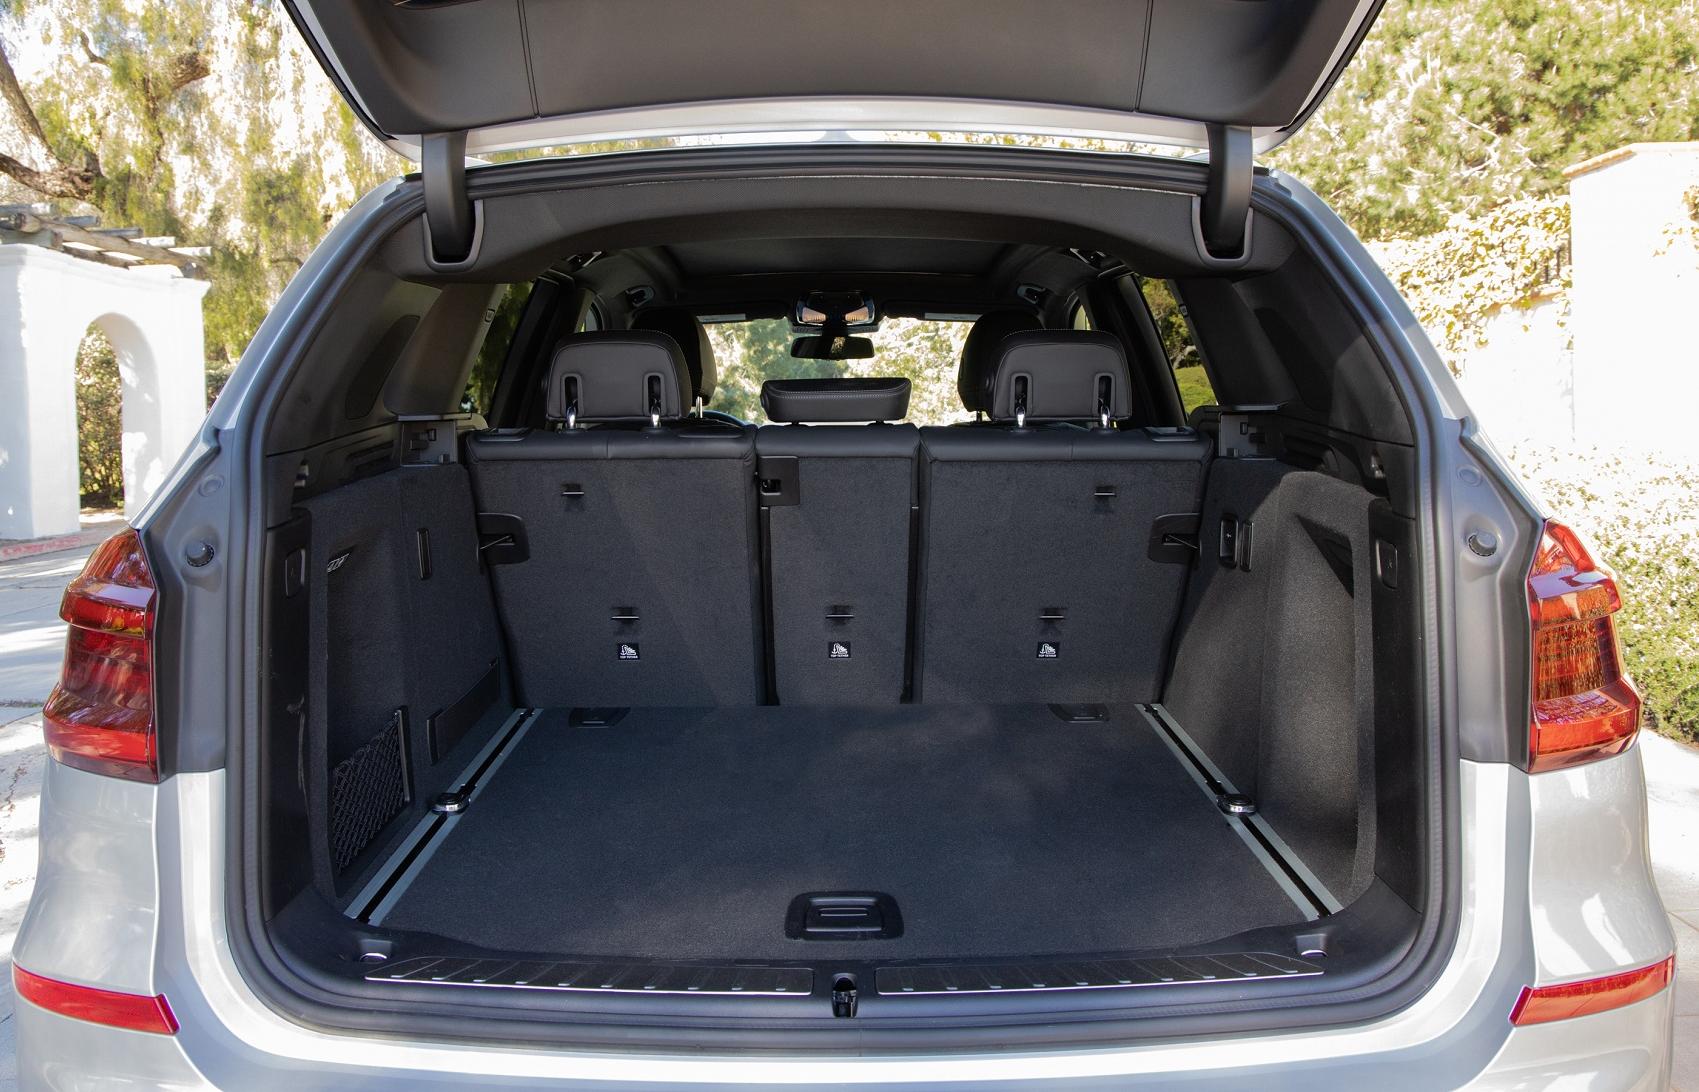 BMW X3 Interior Cargo Area